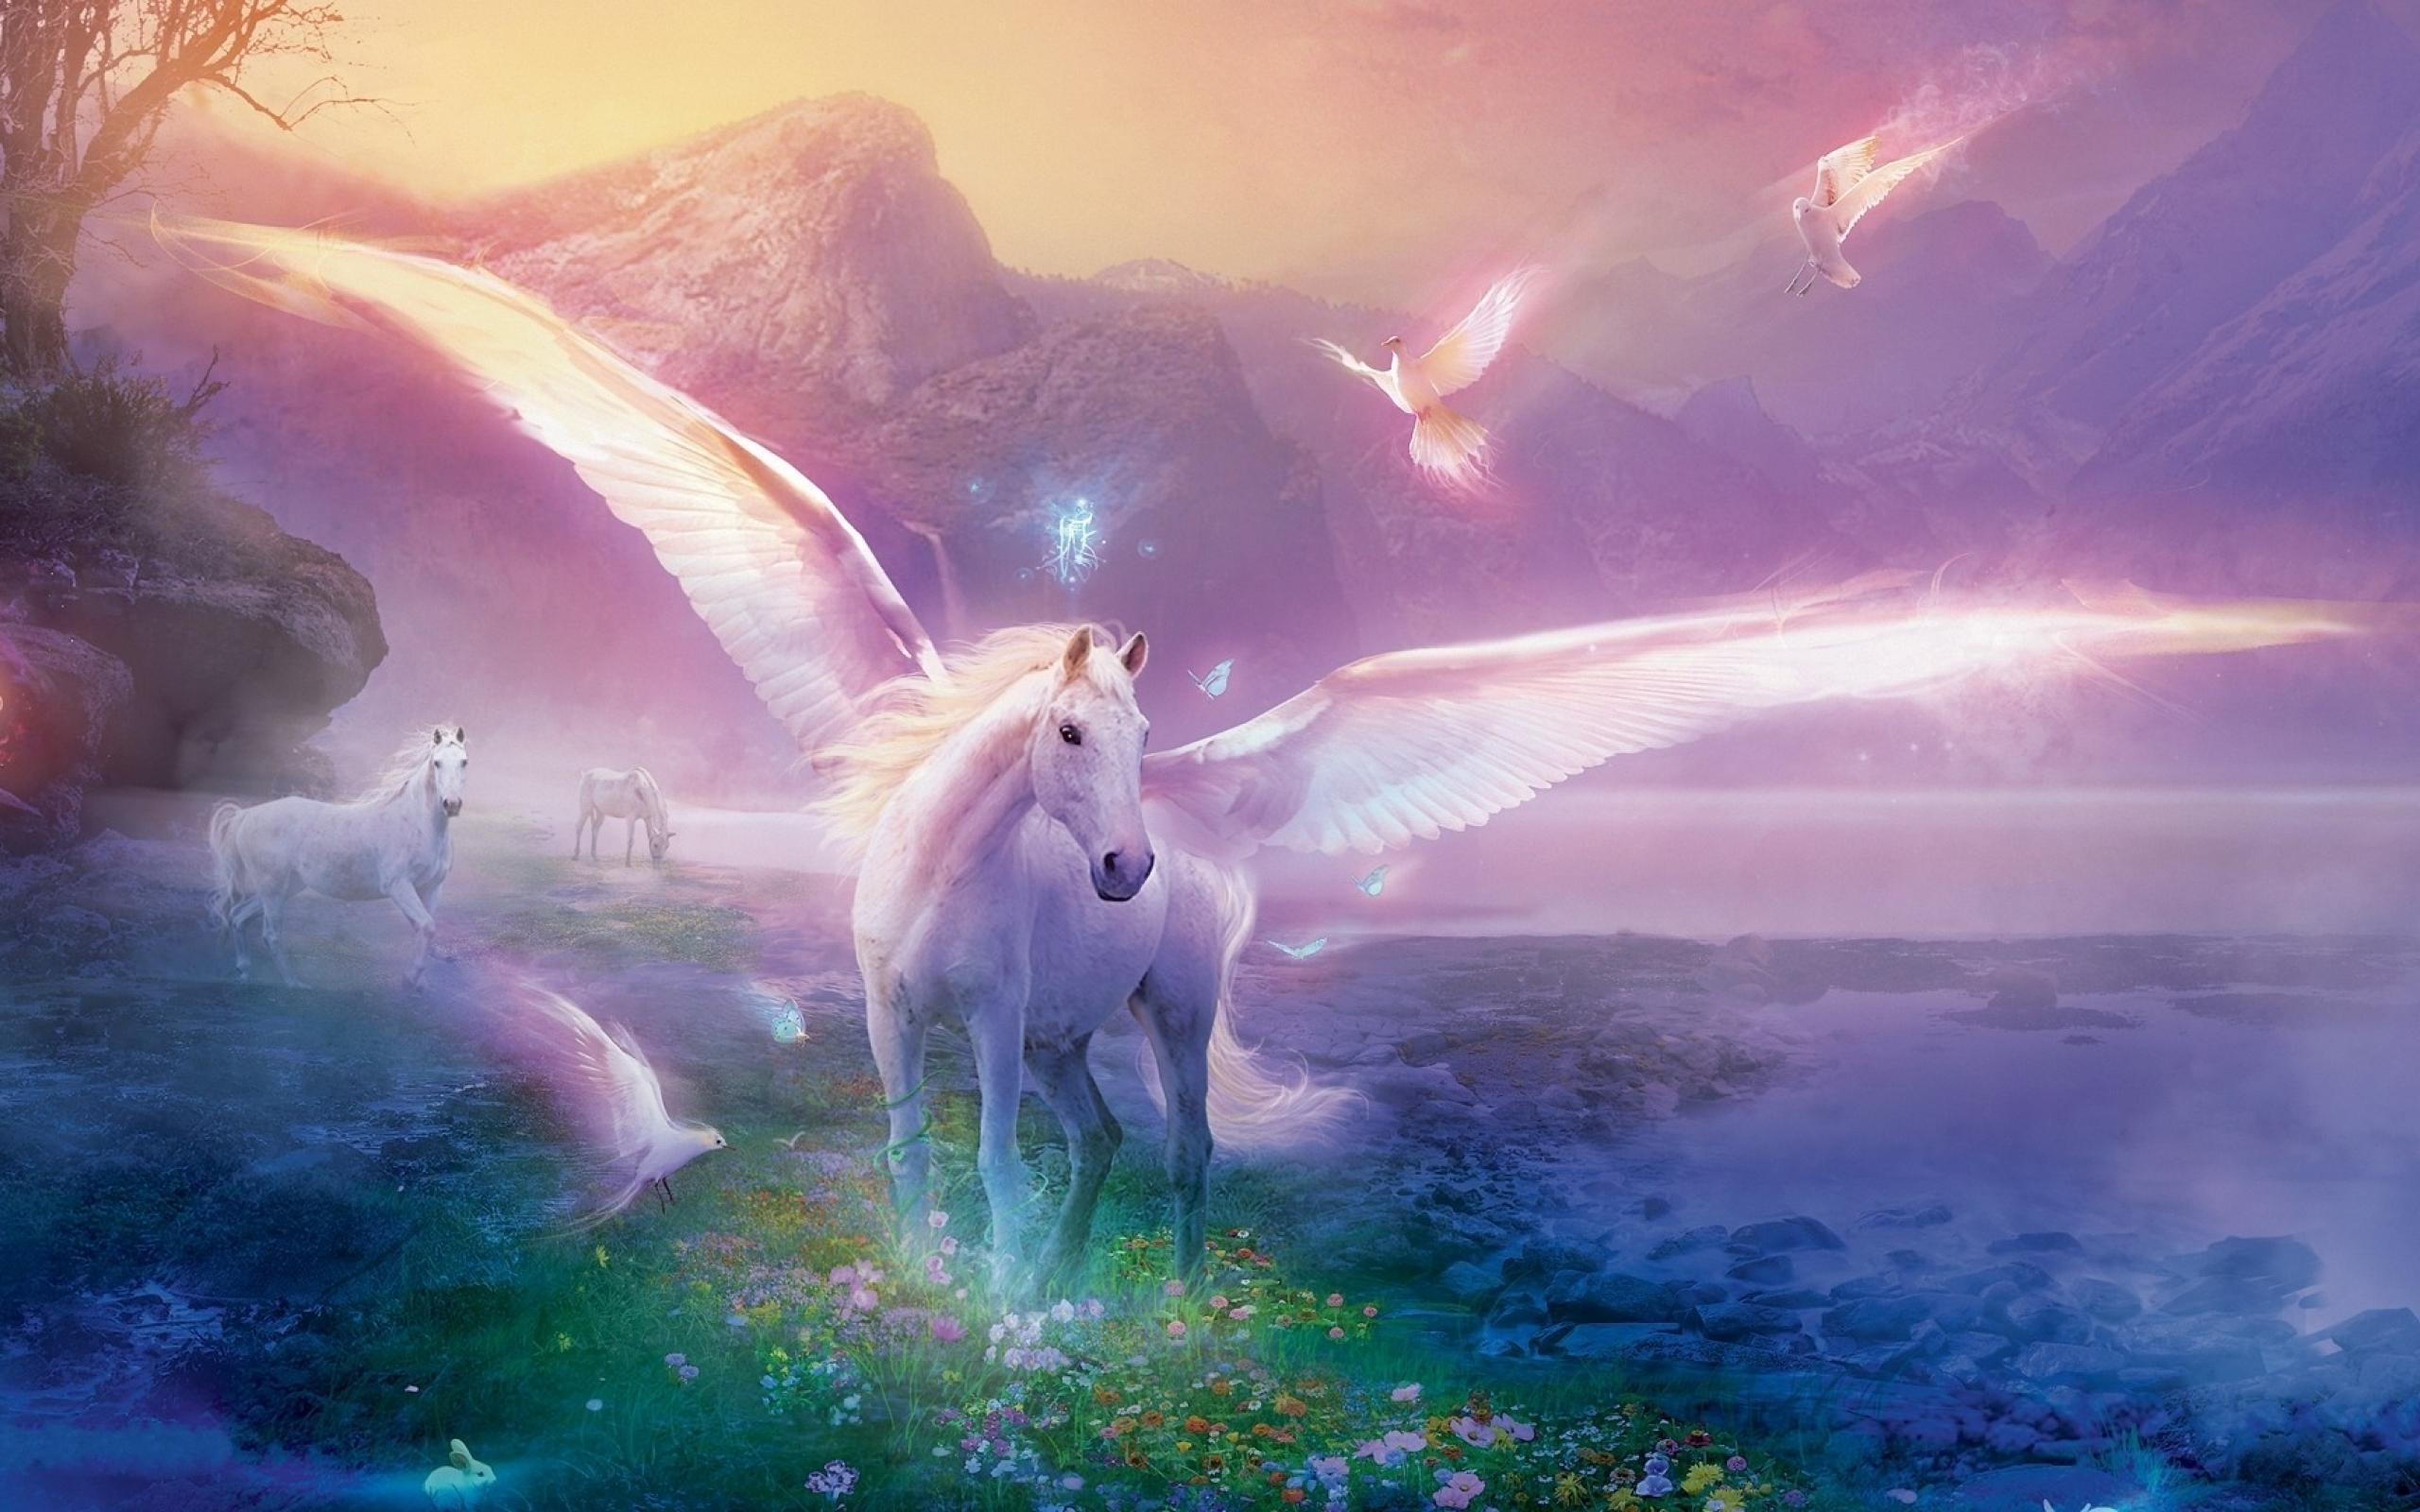 Download Wallpaper Halloween Unicorn - Unicorn-Backgrounds-Free-Download  Picture_472943.jpg